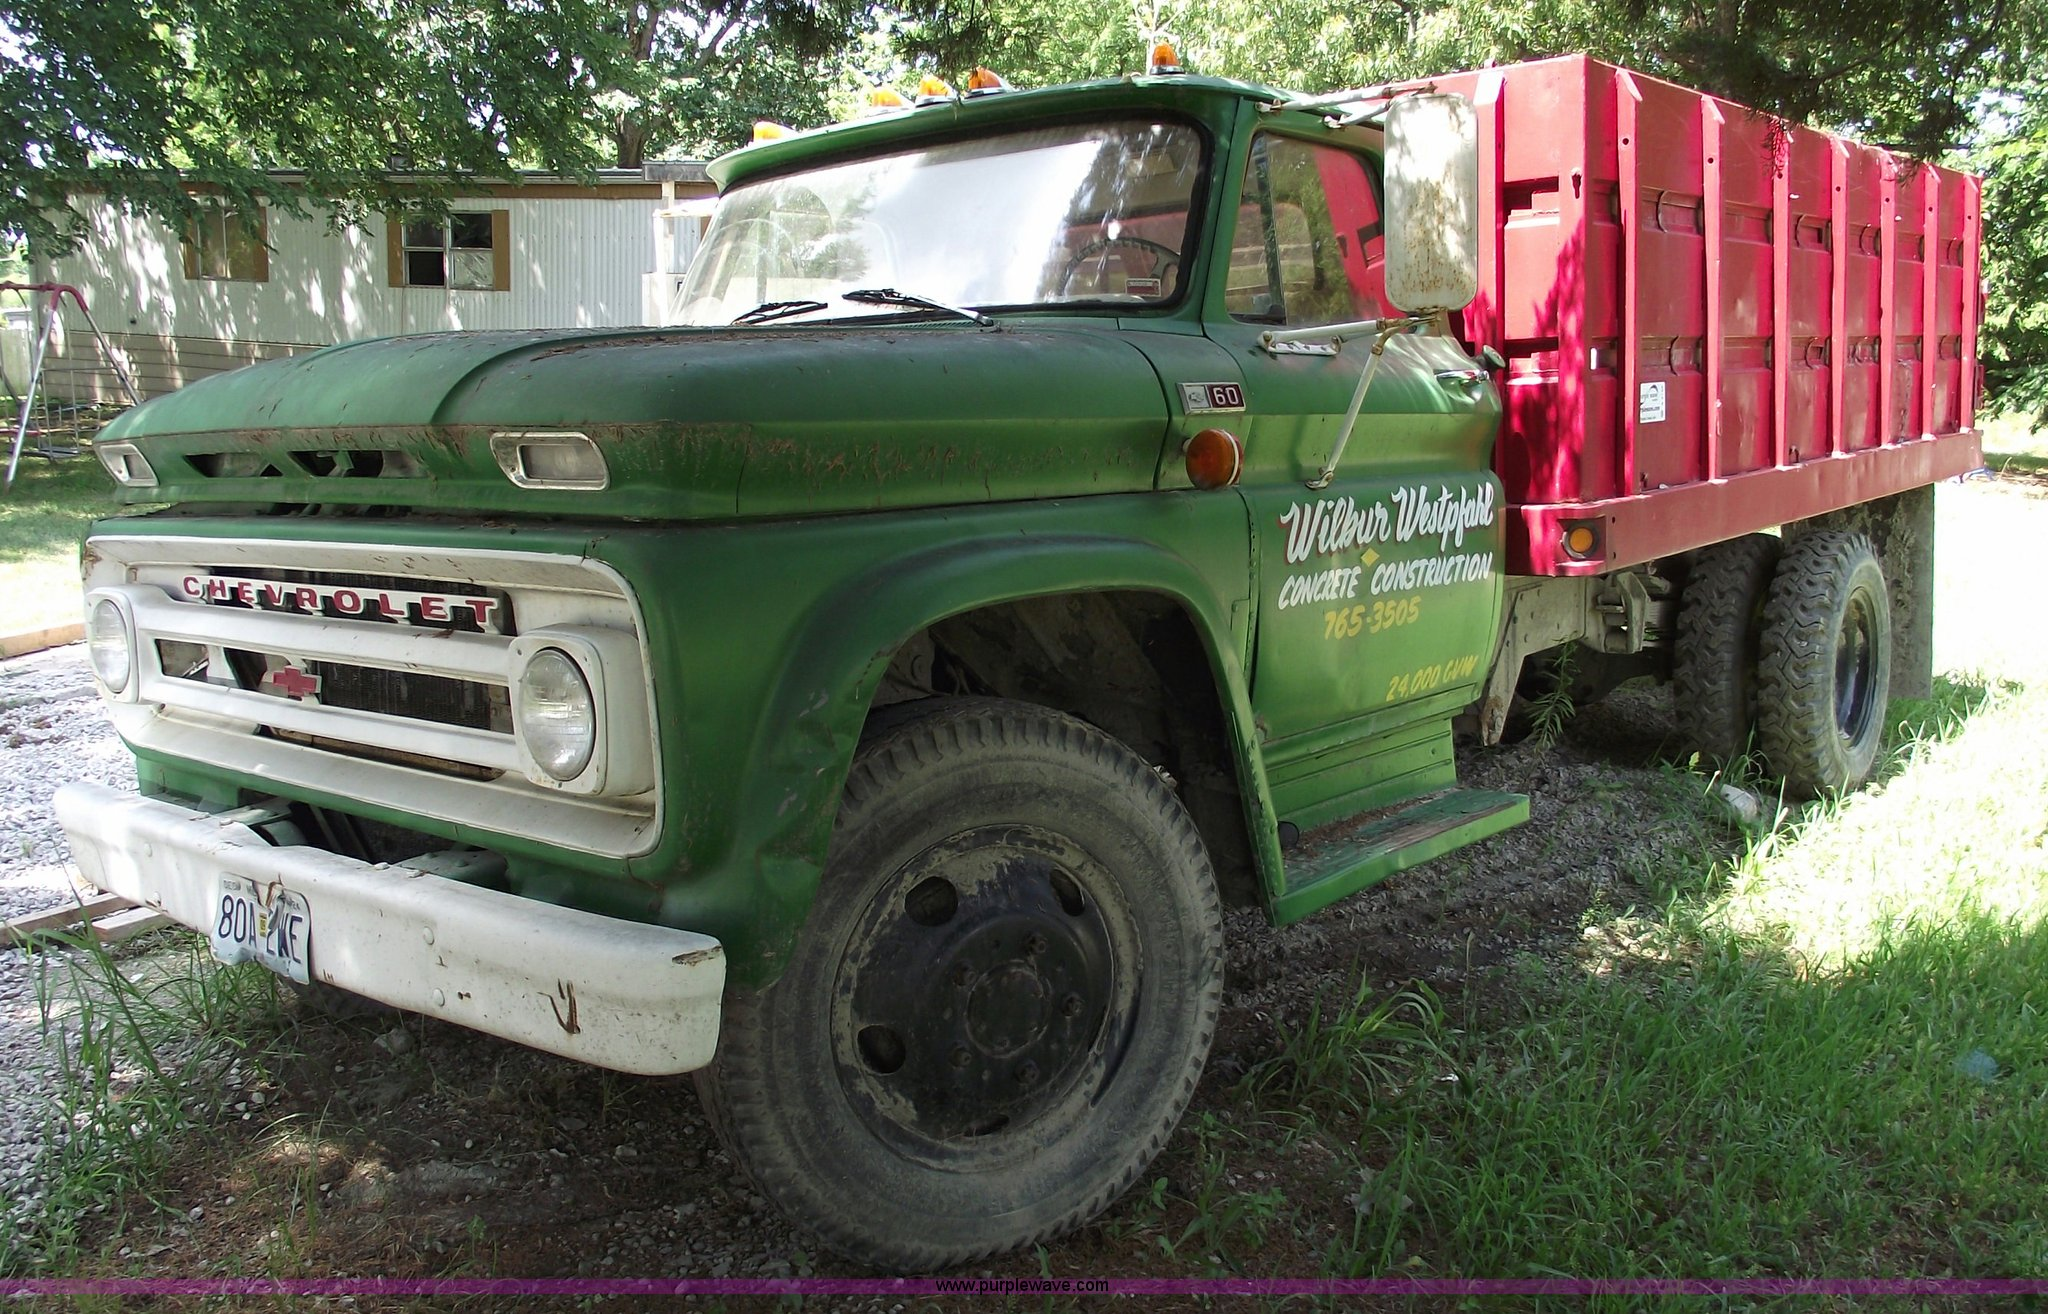 1966 Chevy C60 Wiring Diagram Trusted Diagrams Dump Truck 1965 Chevrolet U2022 Metro